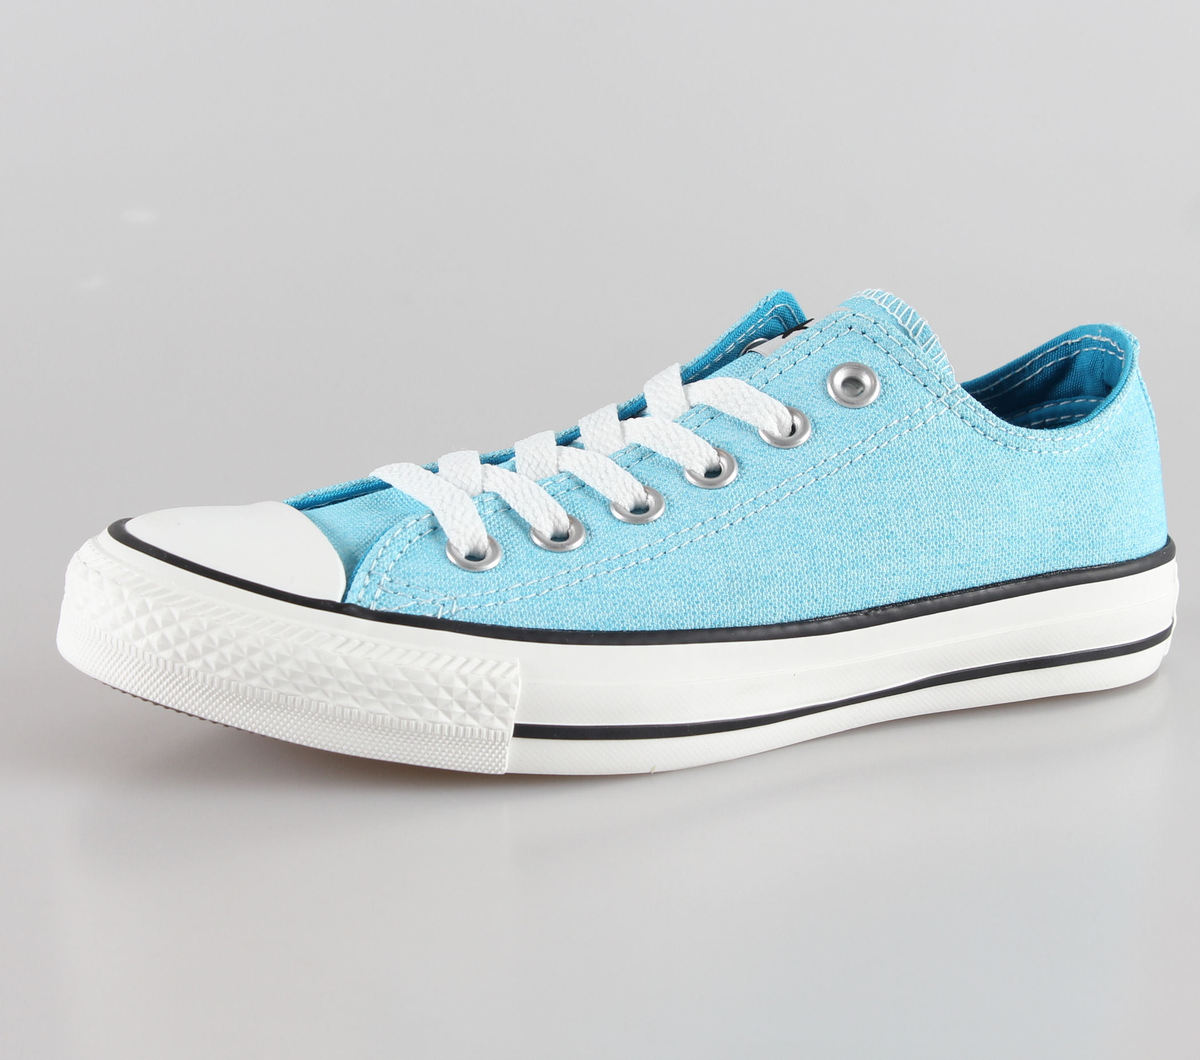 boty dámské CONVERSE - Chuck Taylor All Star OX - NEON - Neon/Blue - C136583